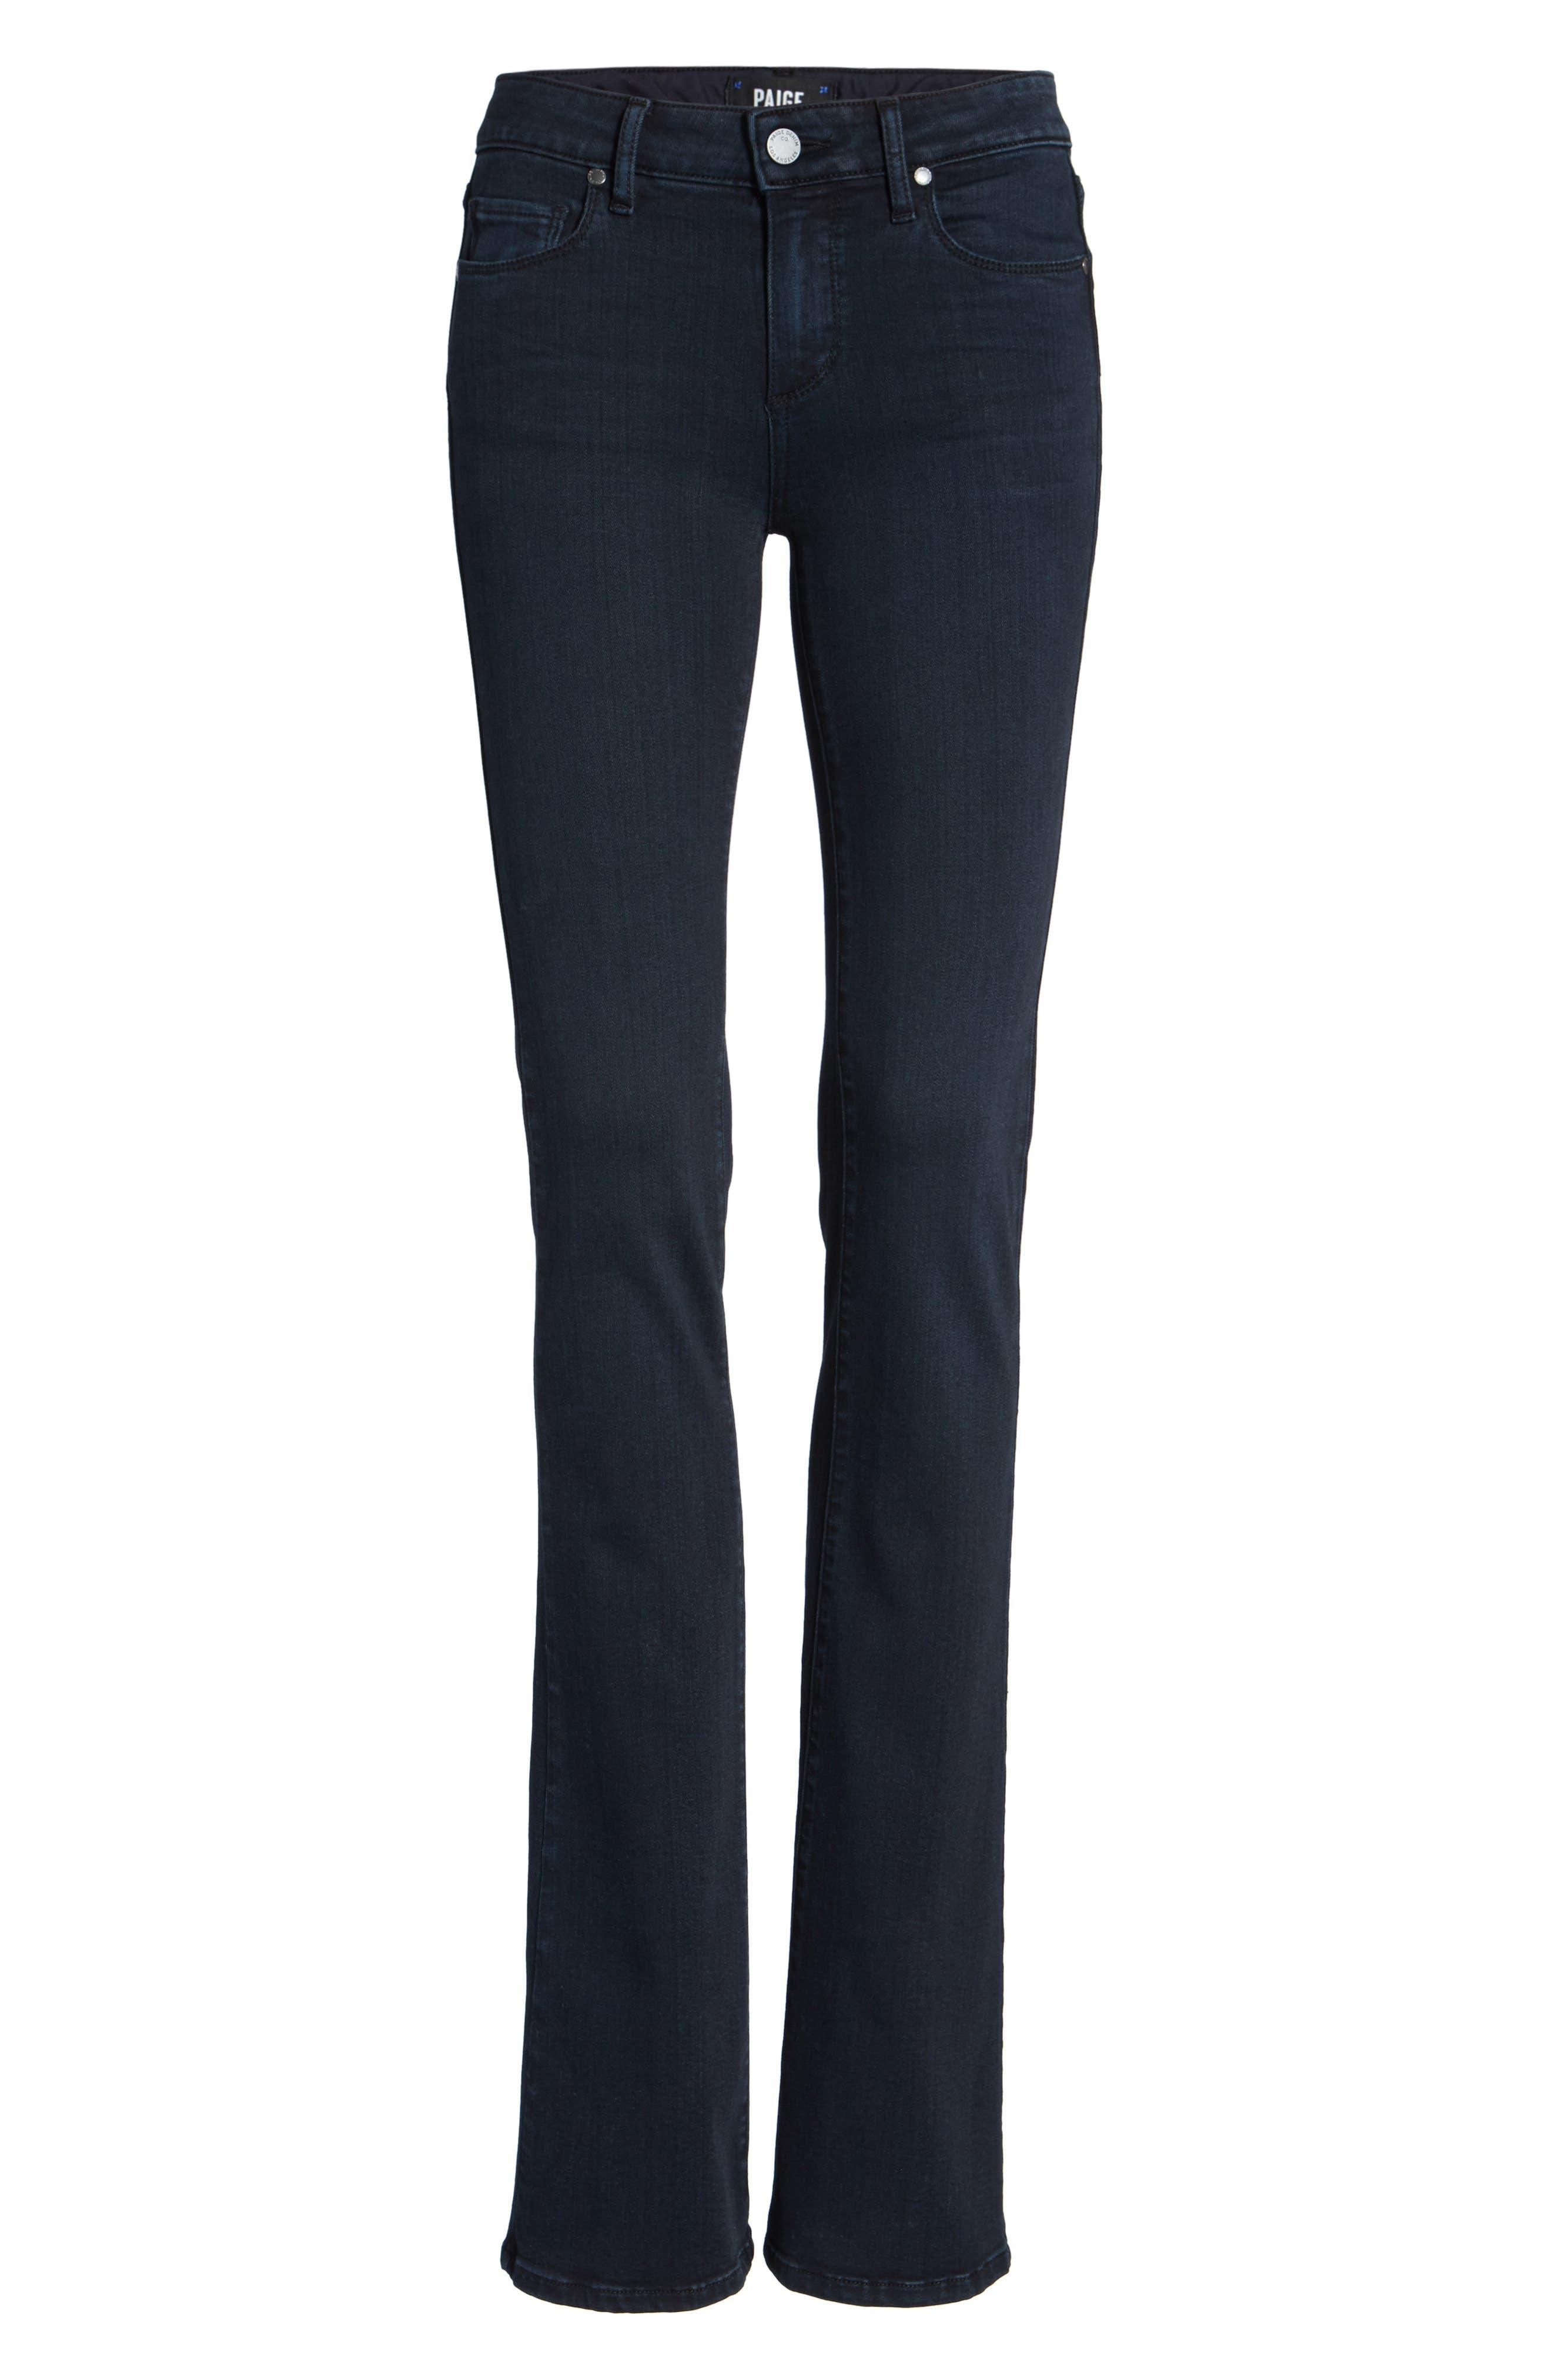 Manhattan High Waist Bootcut Jeans,                             Alternate thumbnail 12, color,